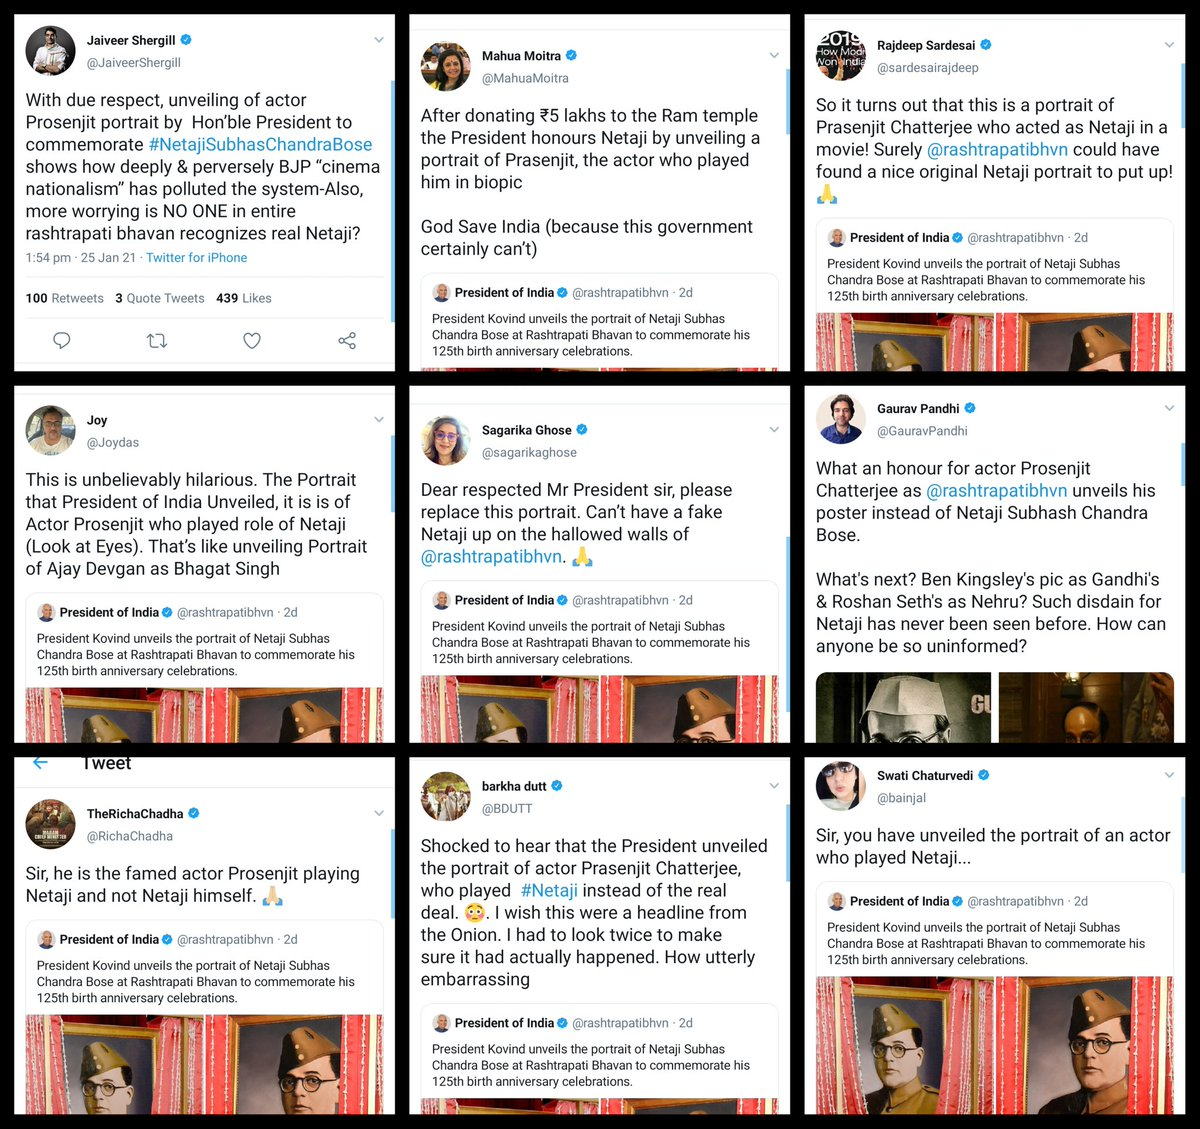 Tag the Congress IT Cell whatsapp group journalists sharing Fake News on Netaji.